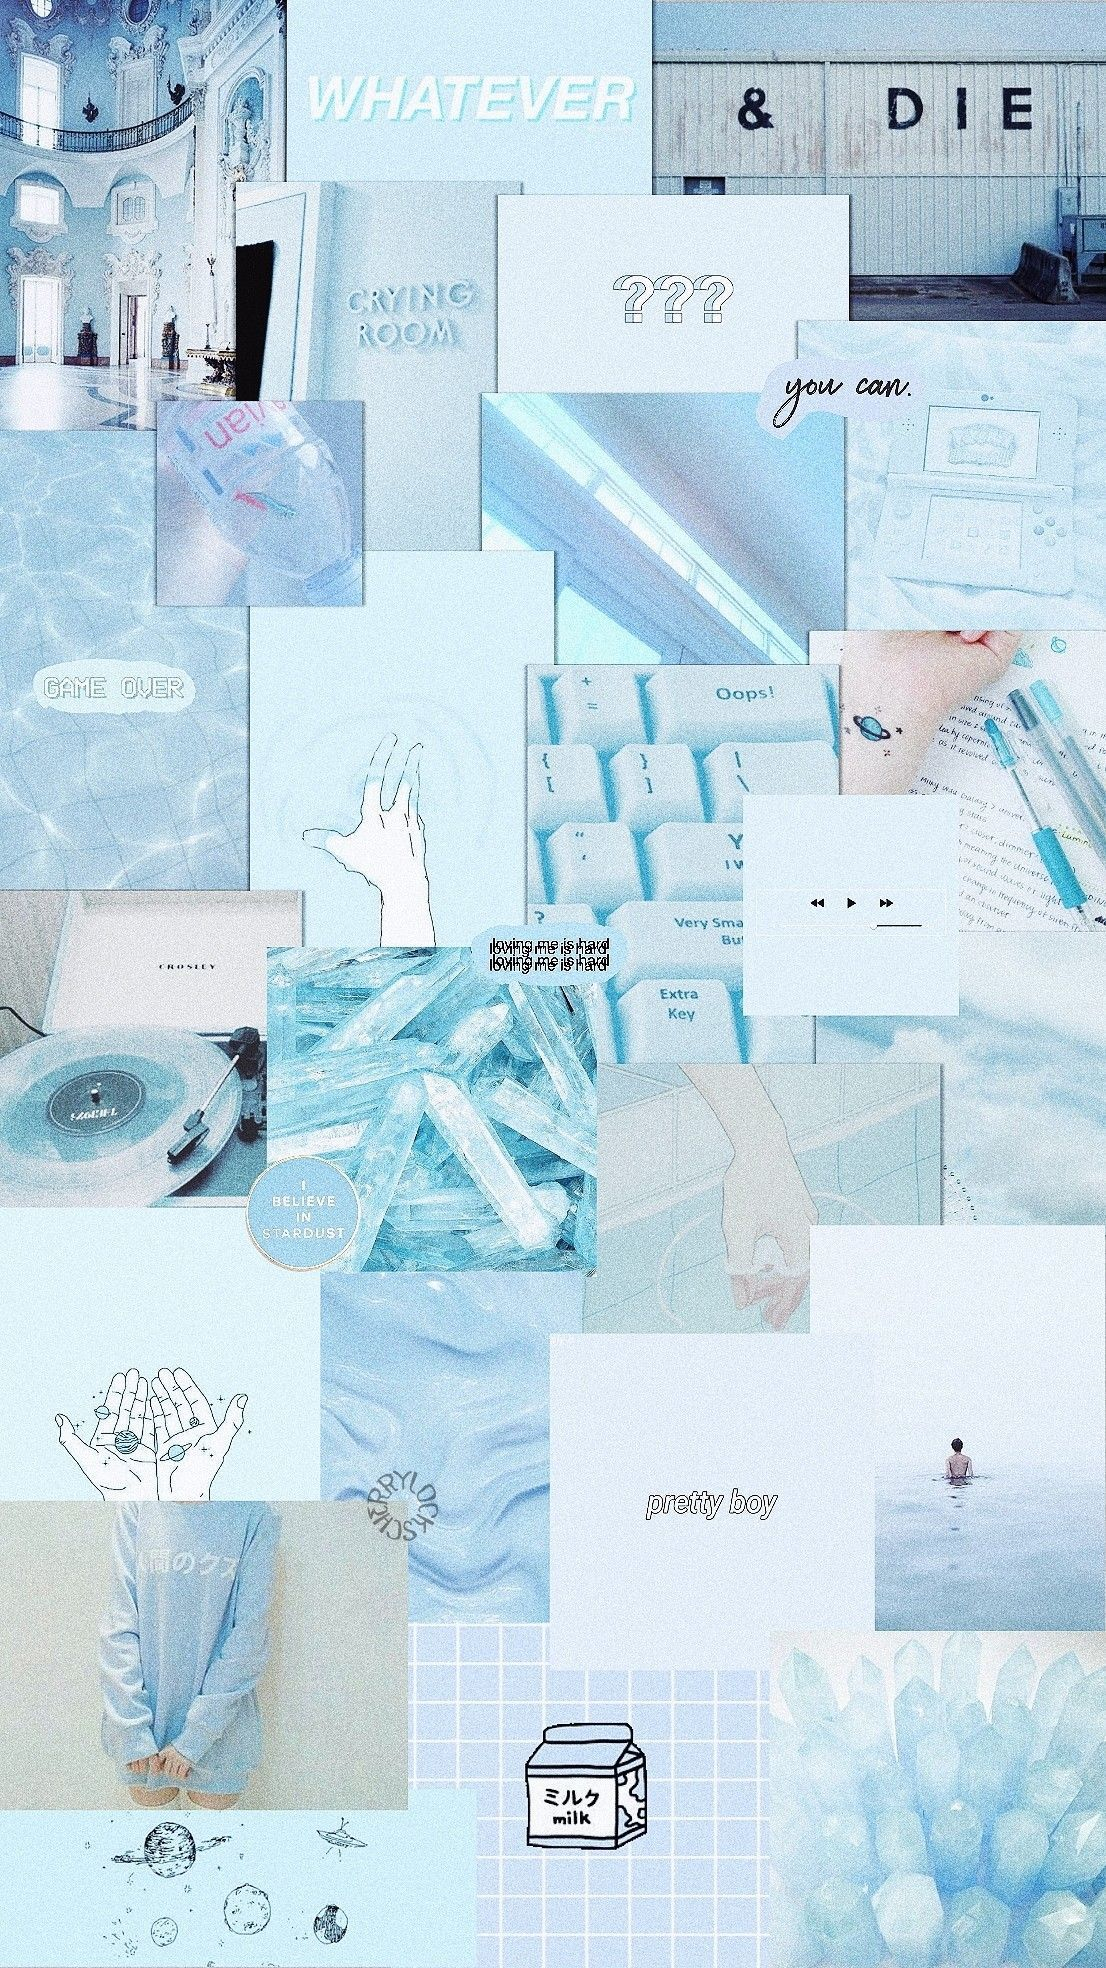 Aesthetic Wallpapers Blue Wallpaper Nice In 2020 Blue Aesthetic Pastel Blue Wallpaper Iphone Aesthetic Iphone Wallpaper